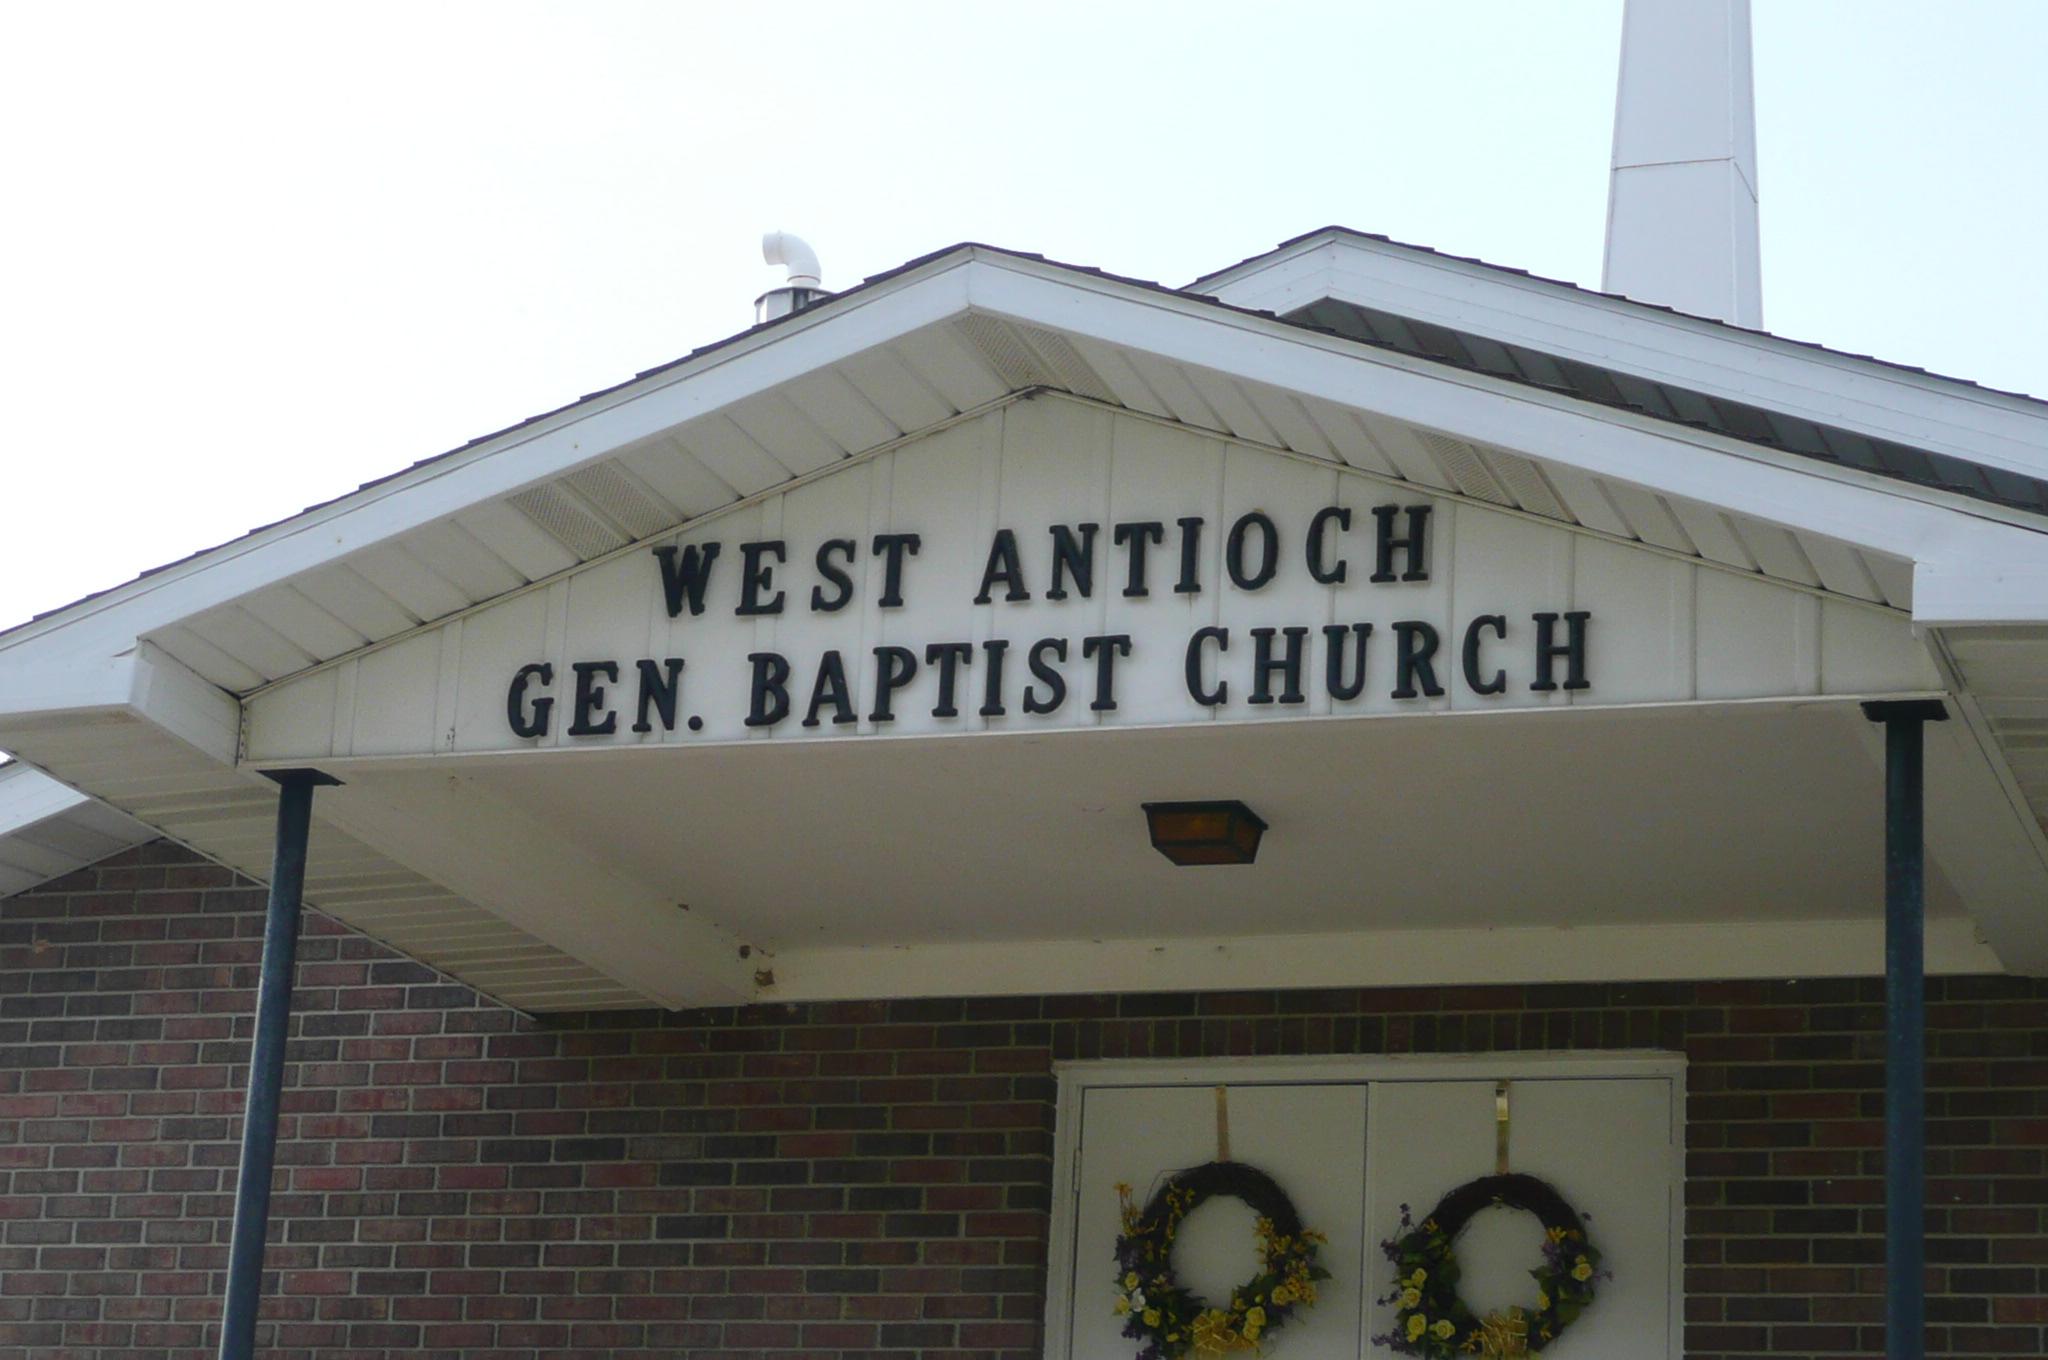 West Antioch Cemetery